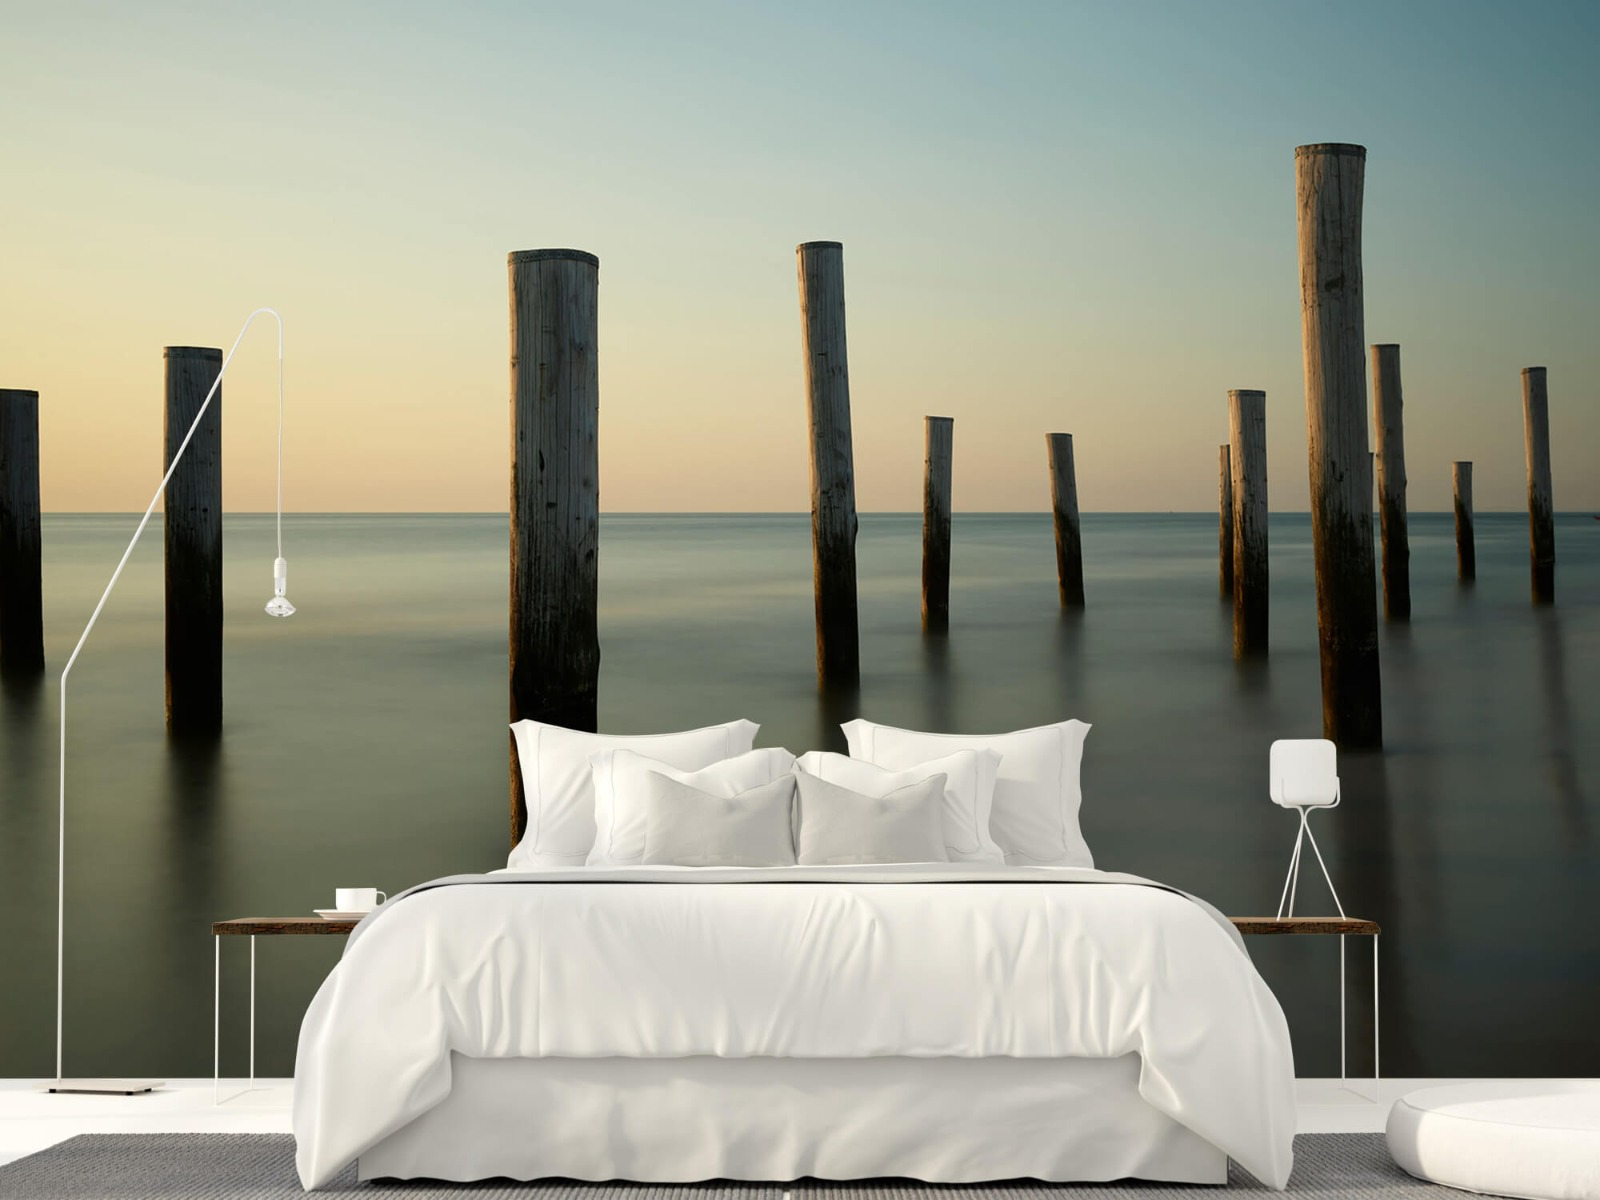 Zeeën en Oceanen - Houten strandpalen - Slaapkamer 17